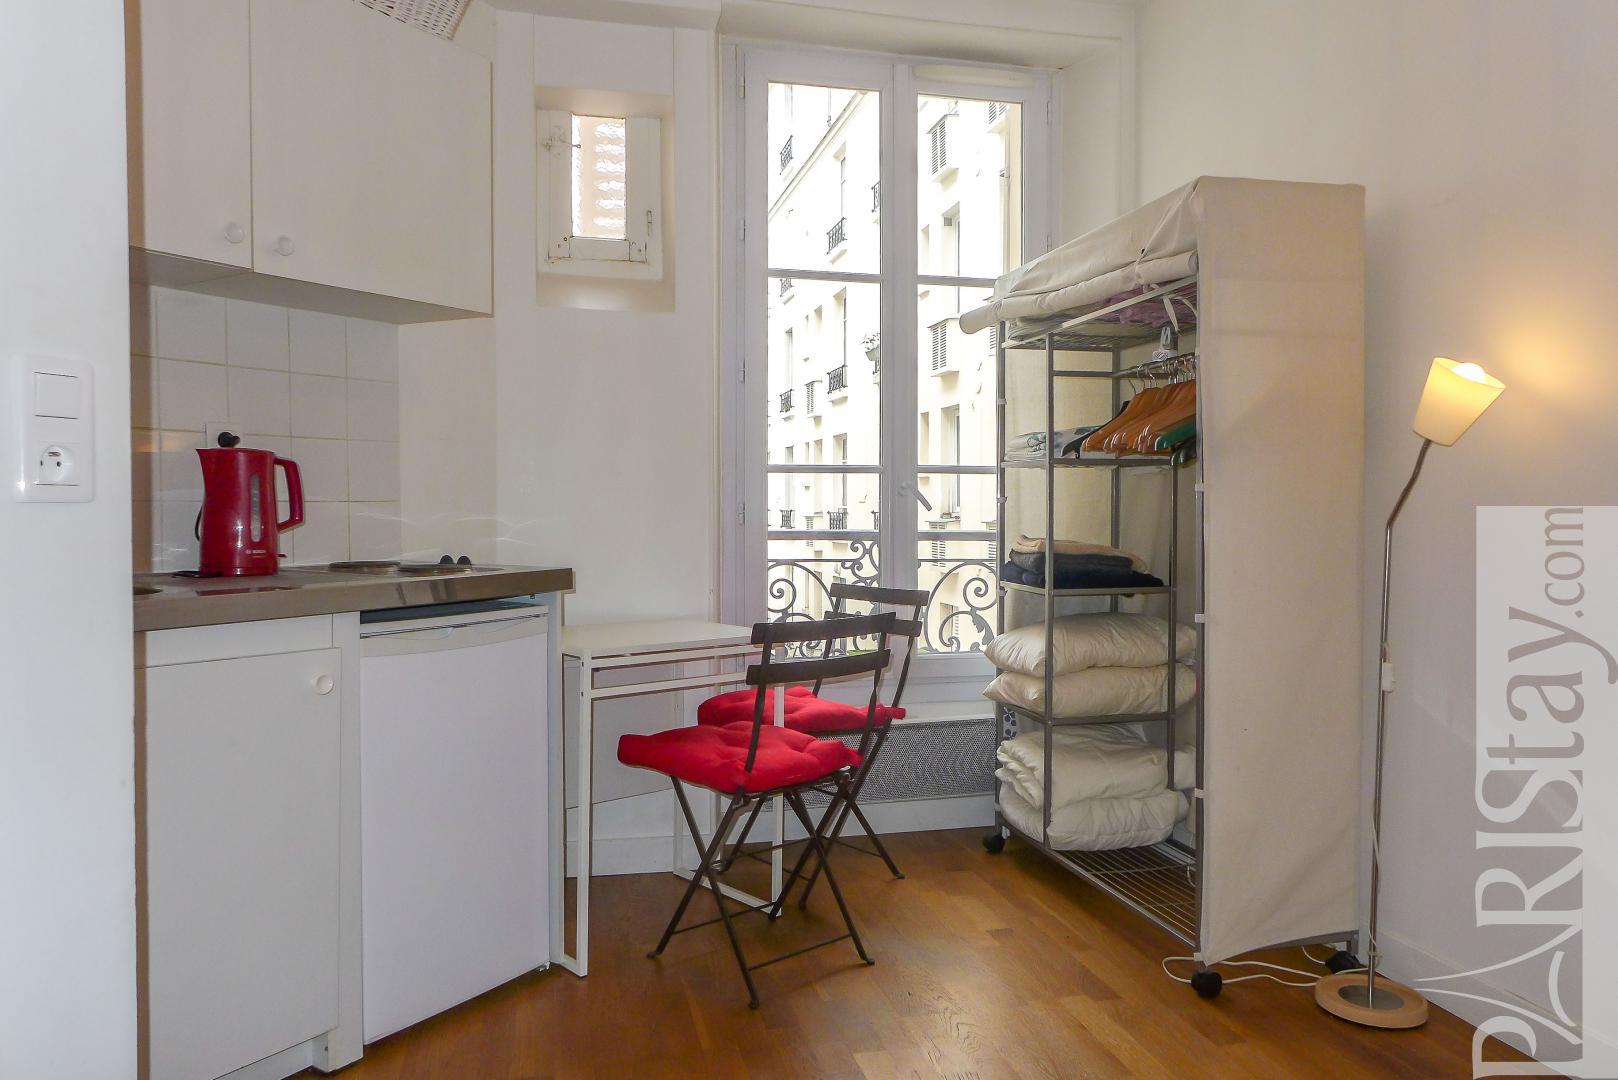 Apartments in Paris long term studio rental Trocadero